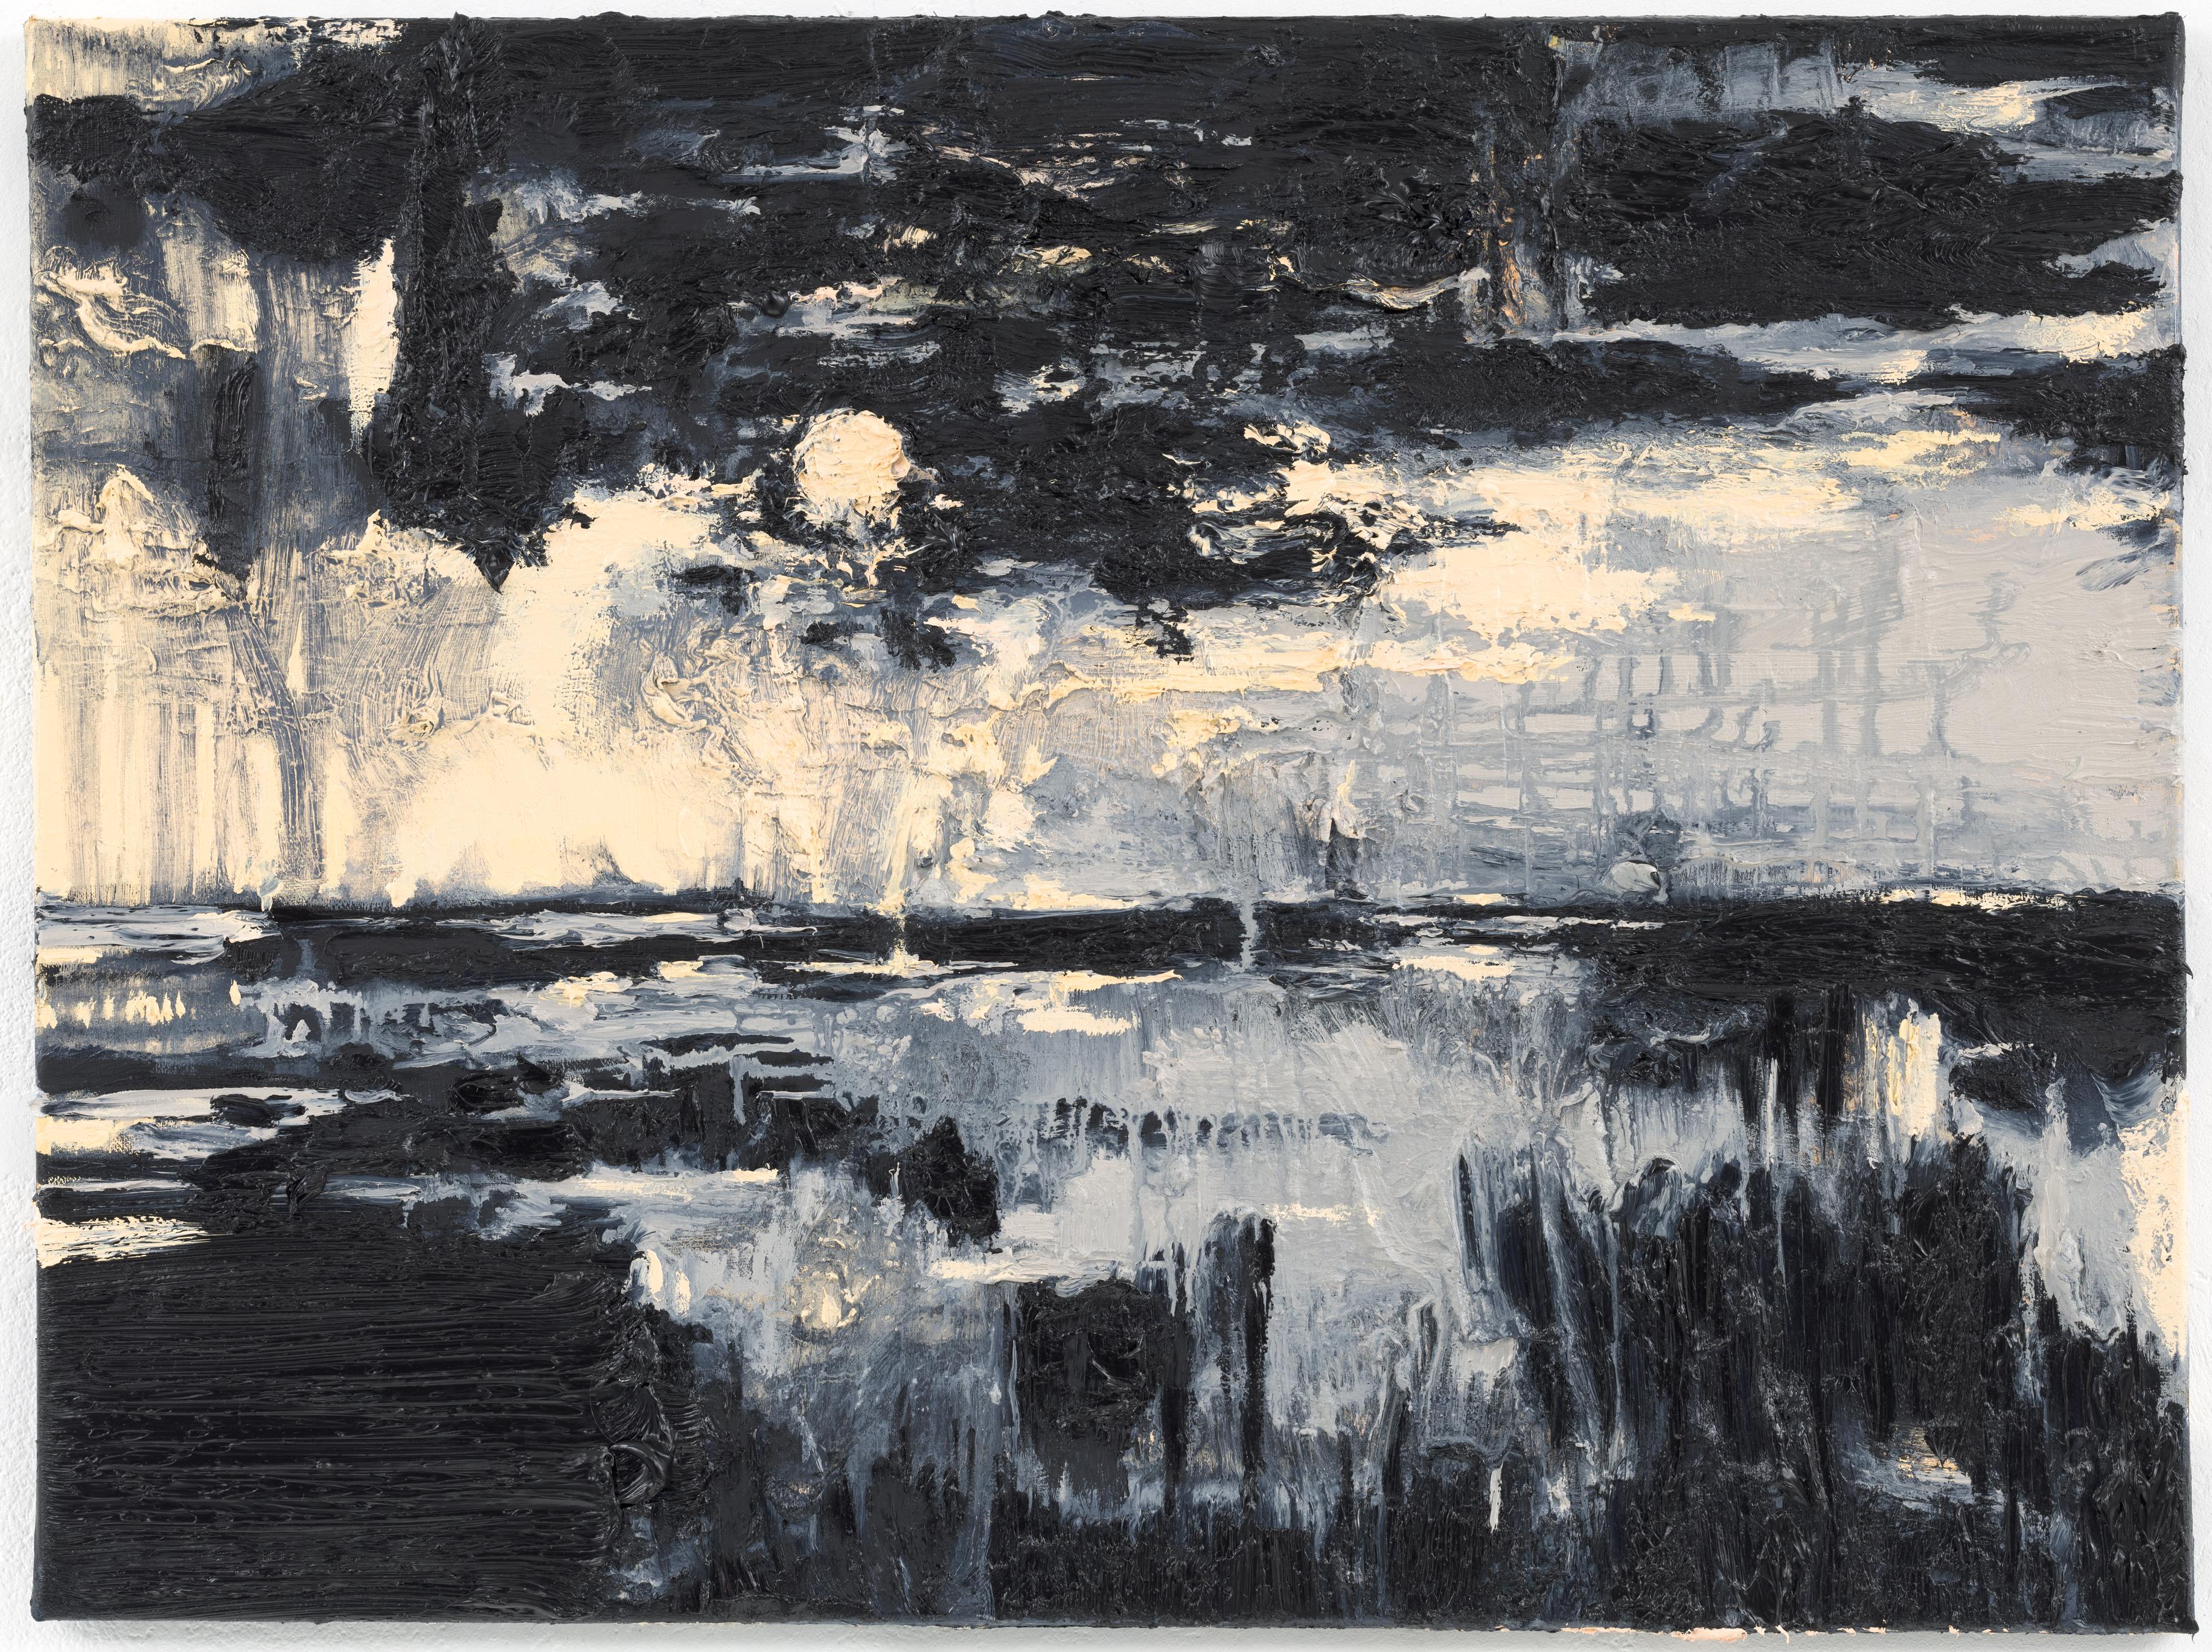 """Luz da Lua I"" 60 x 80 cm. oil on linen 2012"